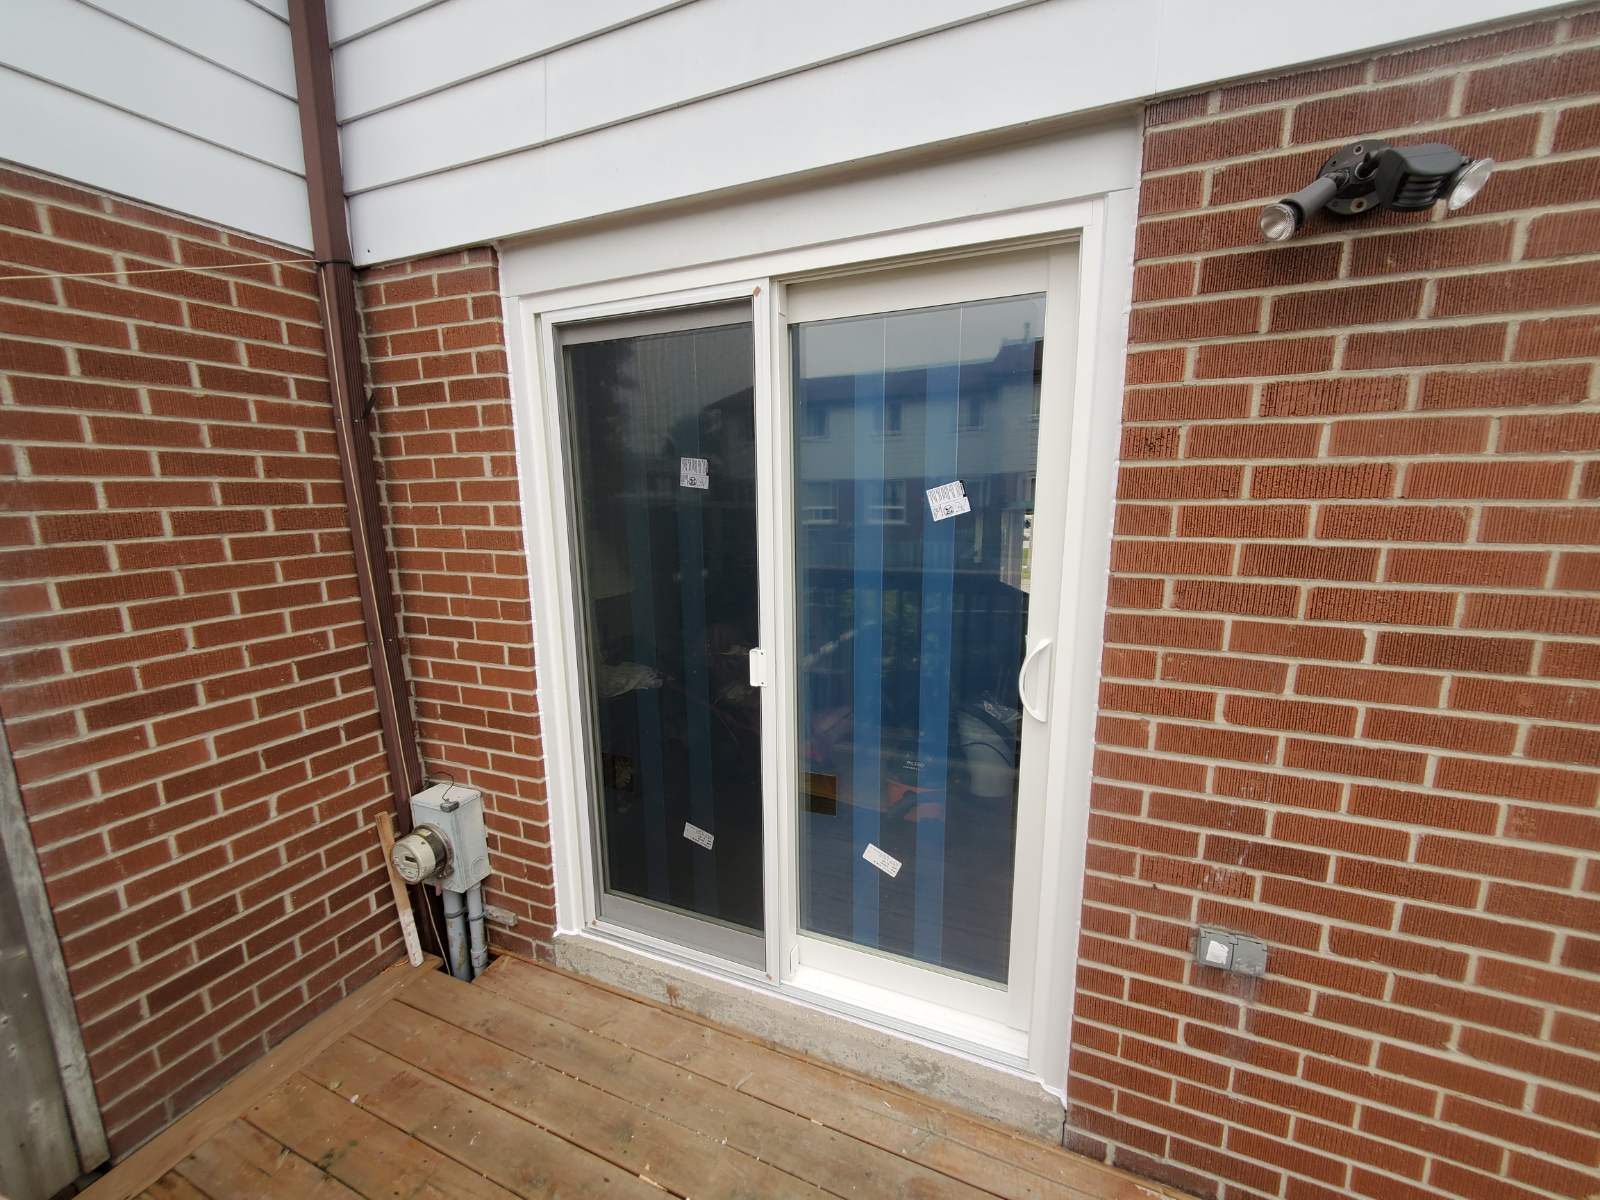 Modern Sliding Door Installation and Replacement, PVC Windows Woodbridge, Maple, Vaughan, King, Aurora, Nemwarket, Caledon, Nobleton, Kleinburg